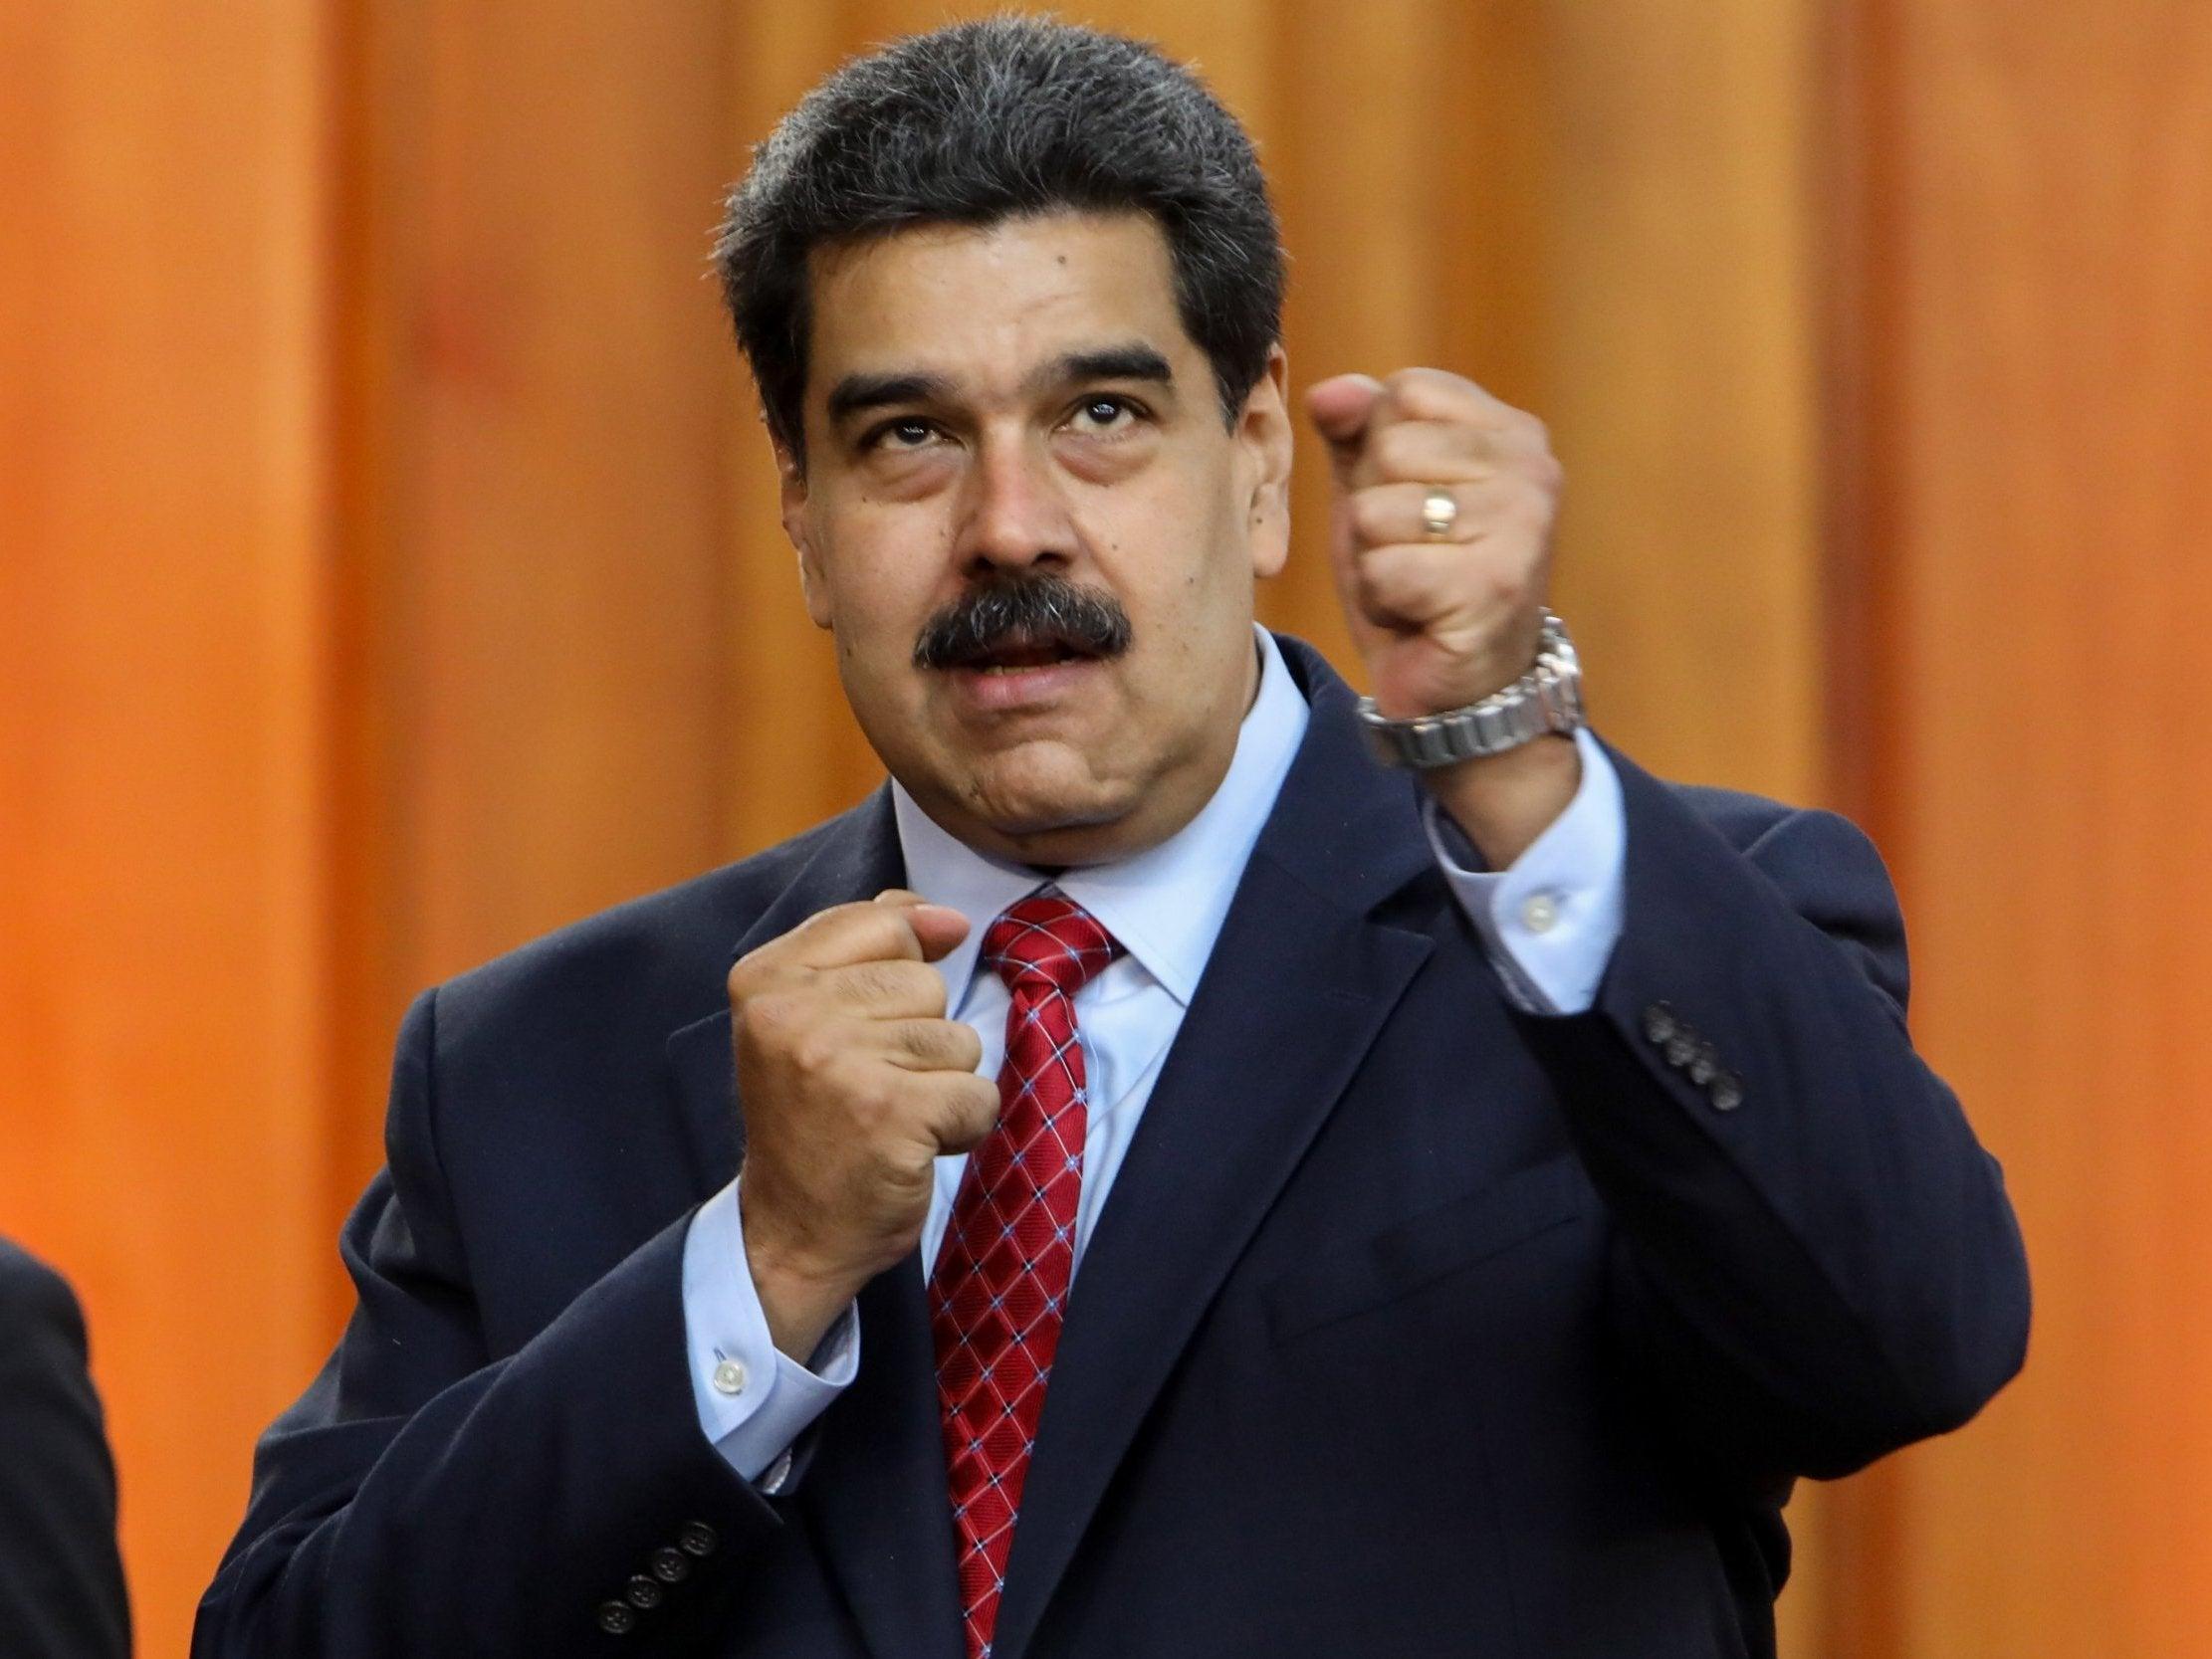 ef6b6ec62 Venezuela crisis: Maduro accuses Trump of hiring Colombian mafia to  assassinate him   The Independent